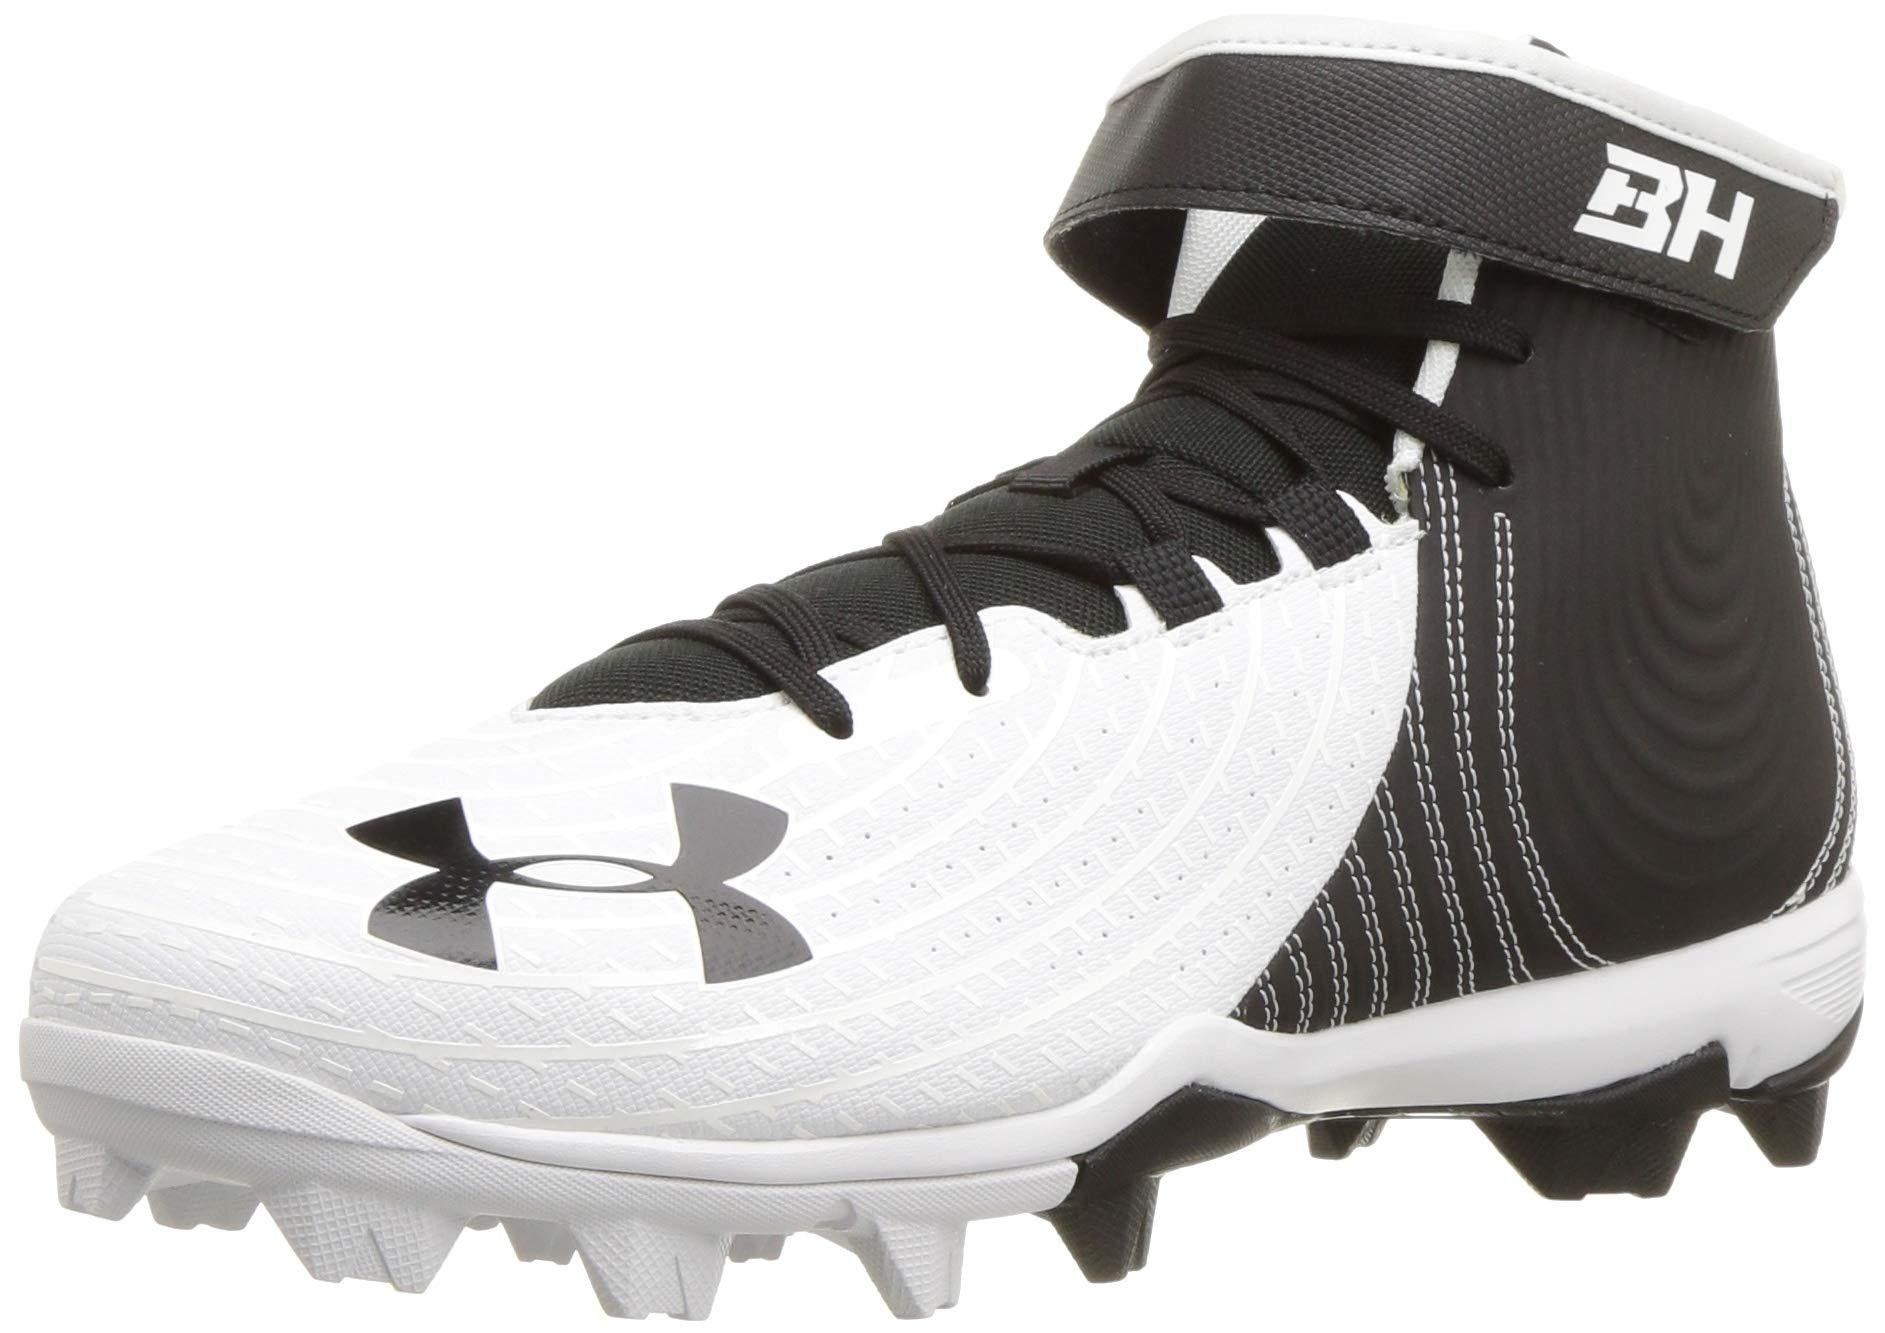 Under Armour Men's Harper 4 Mid RM Baseball Shoe, White//Black, 9 by Under Armour